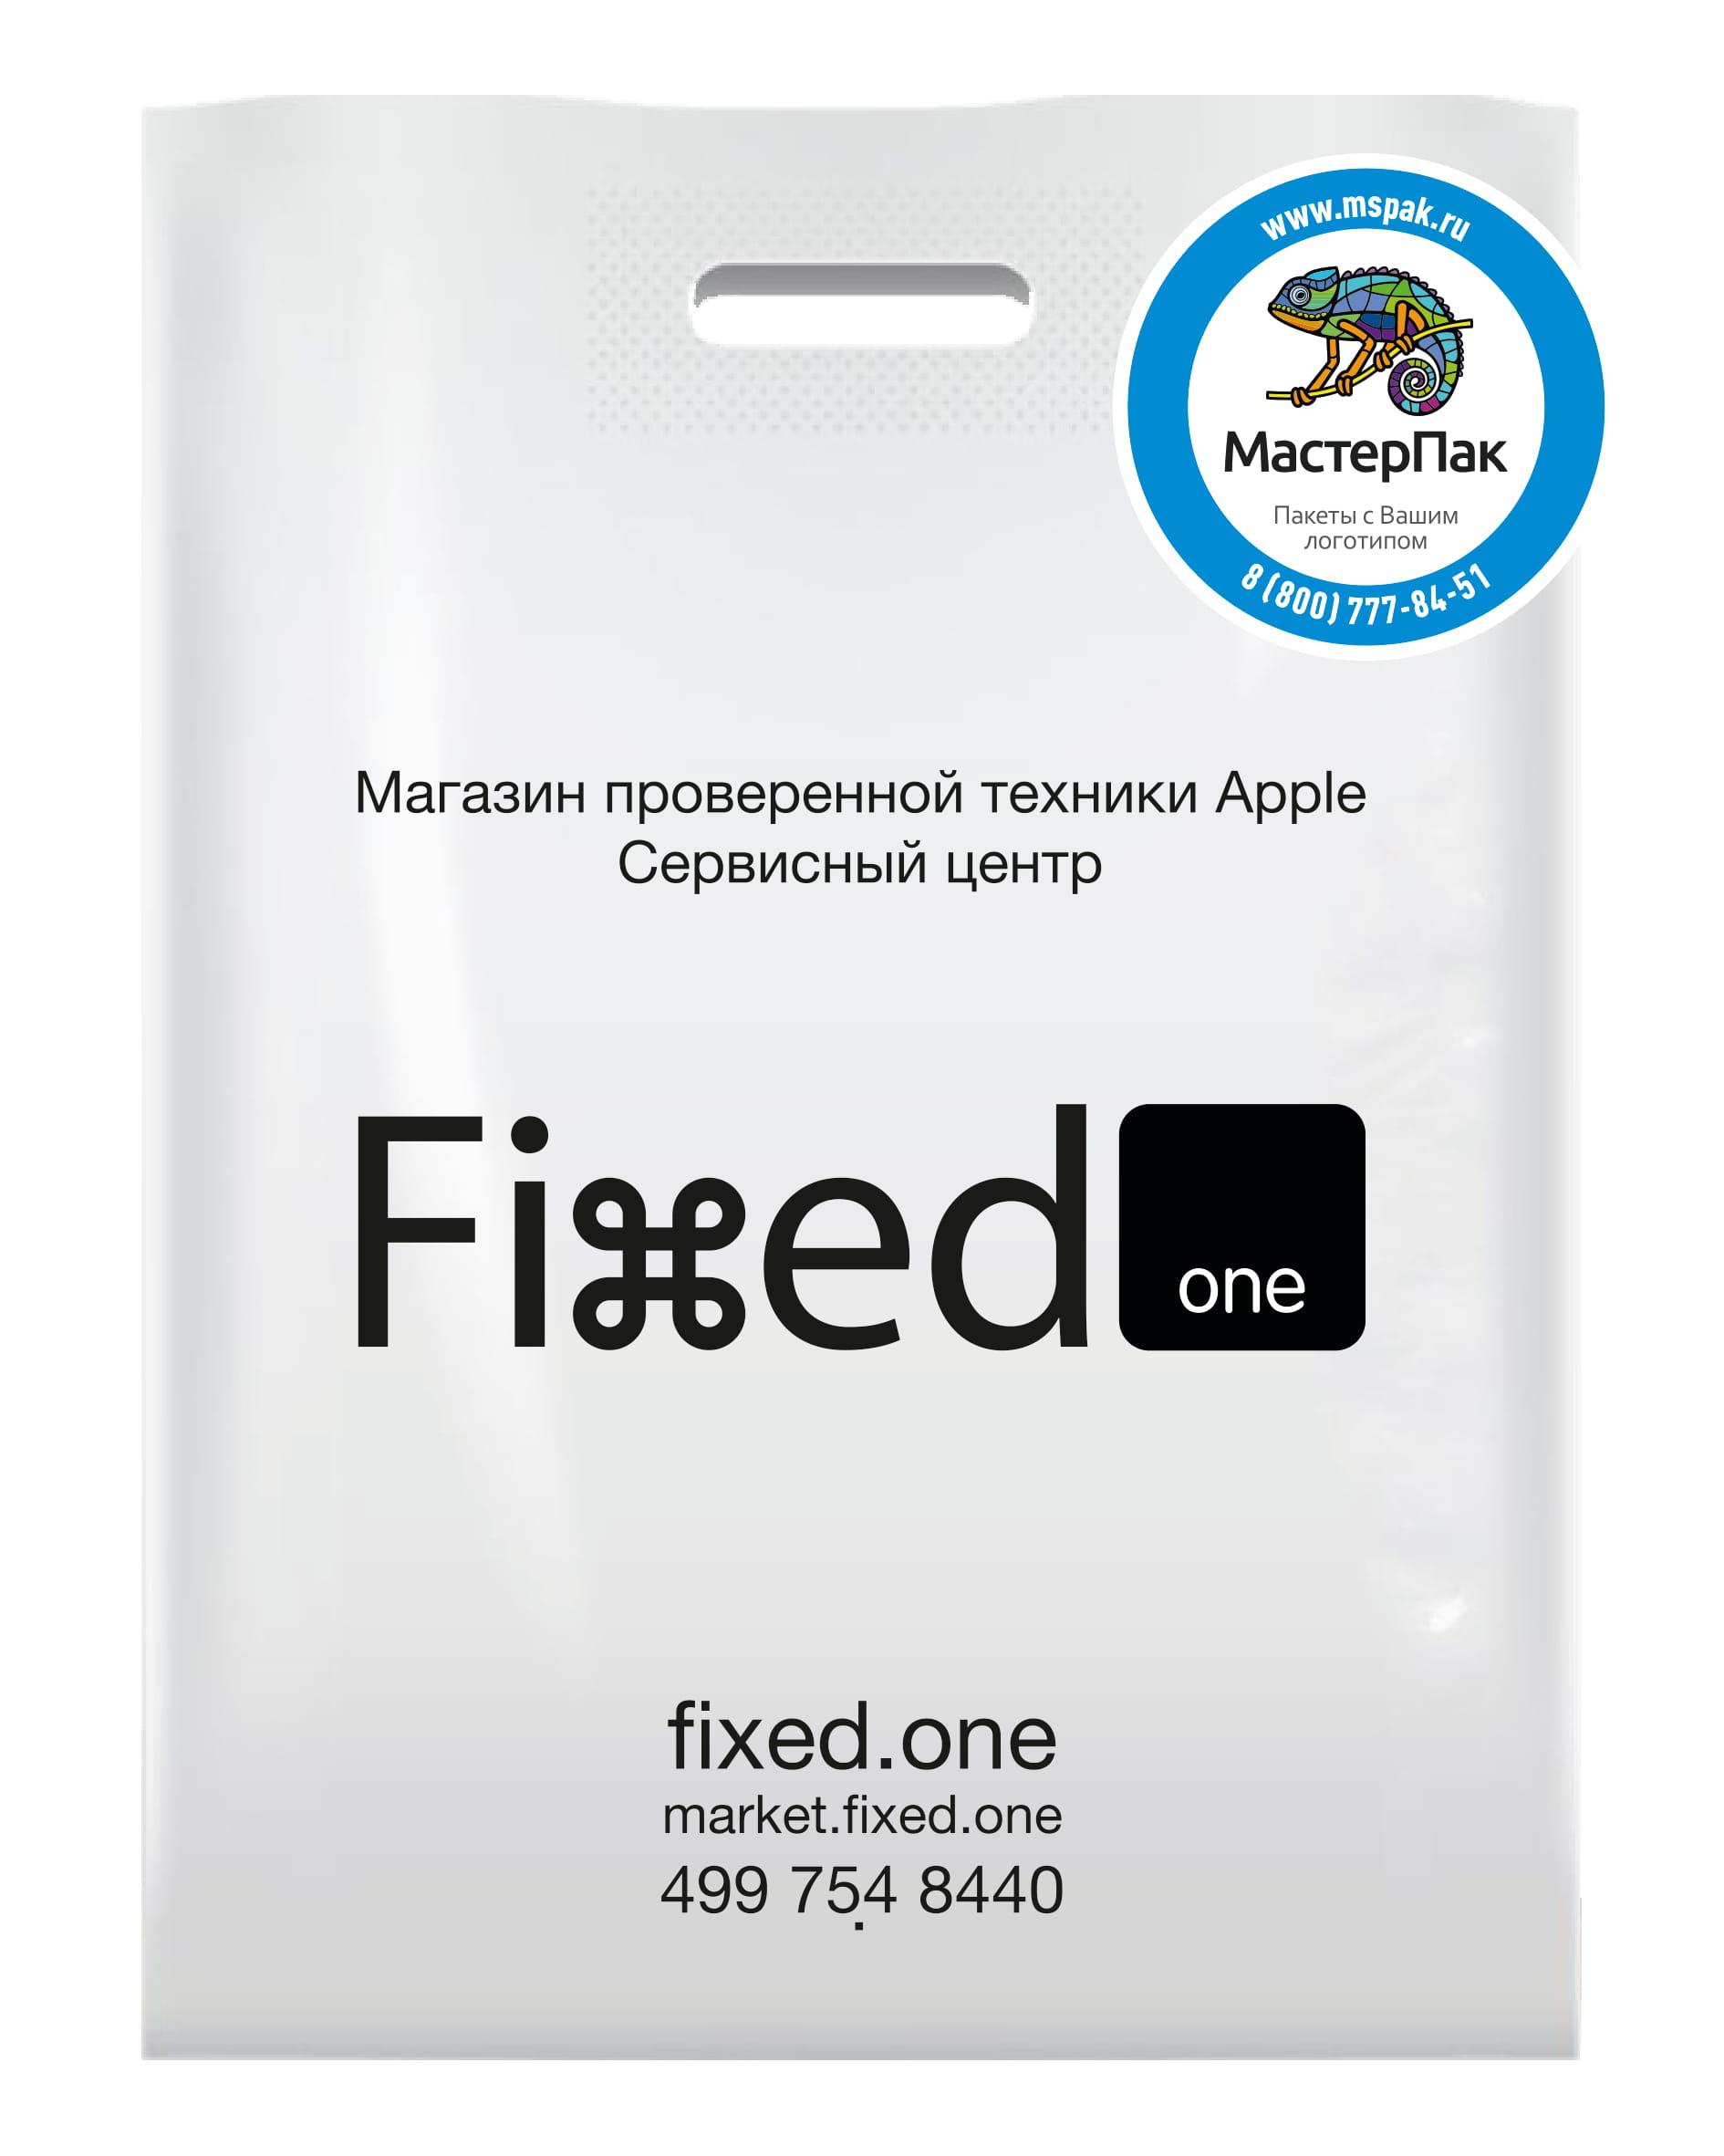 Пакет ПВД с логотипом Fixed one, Москва, 70 мкм, 30*40